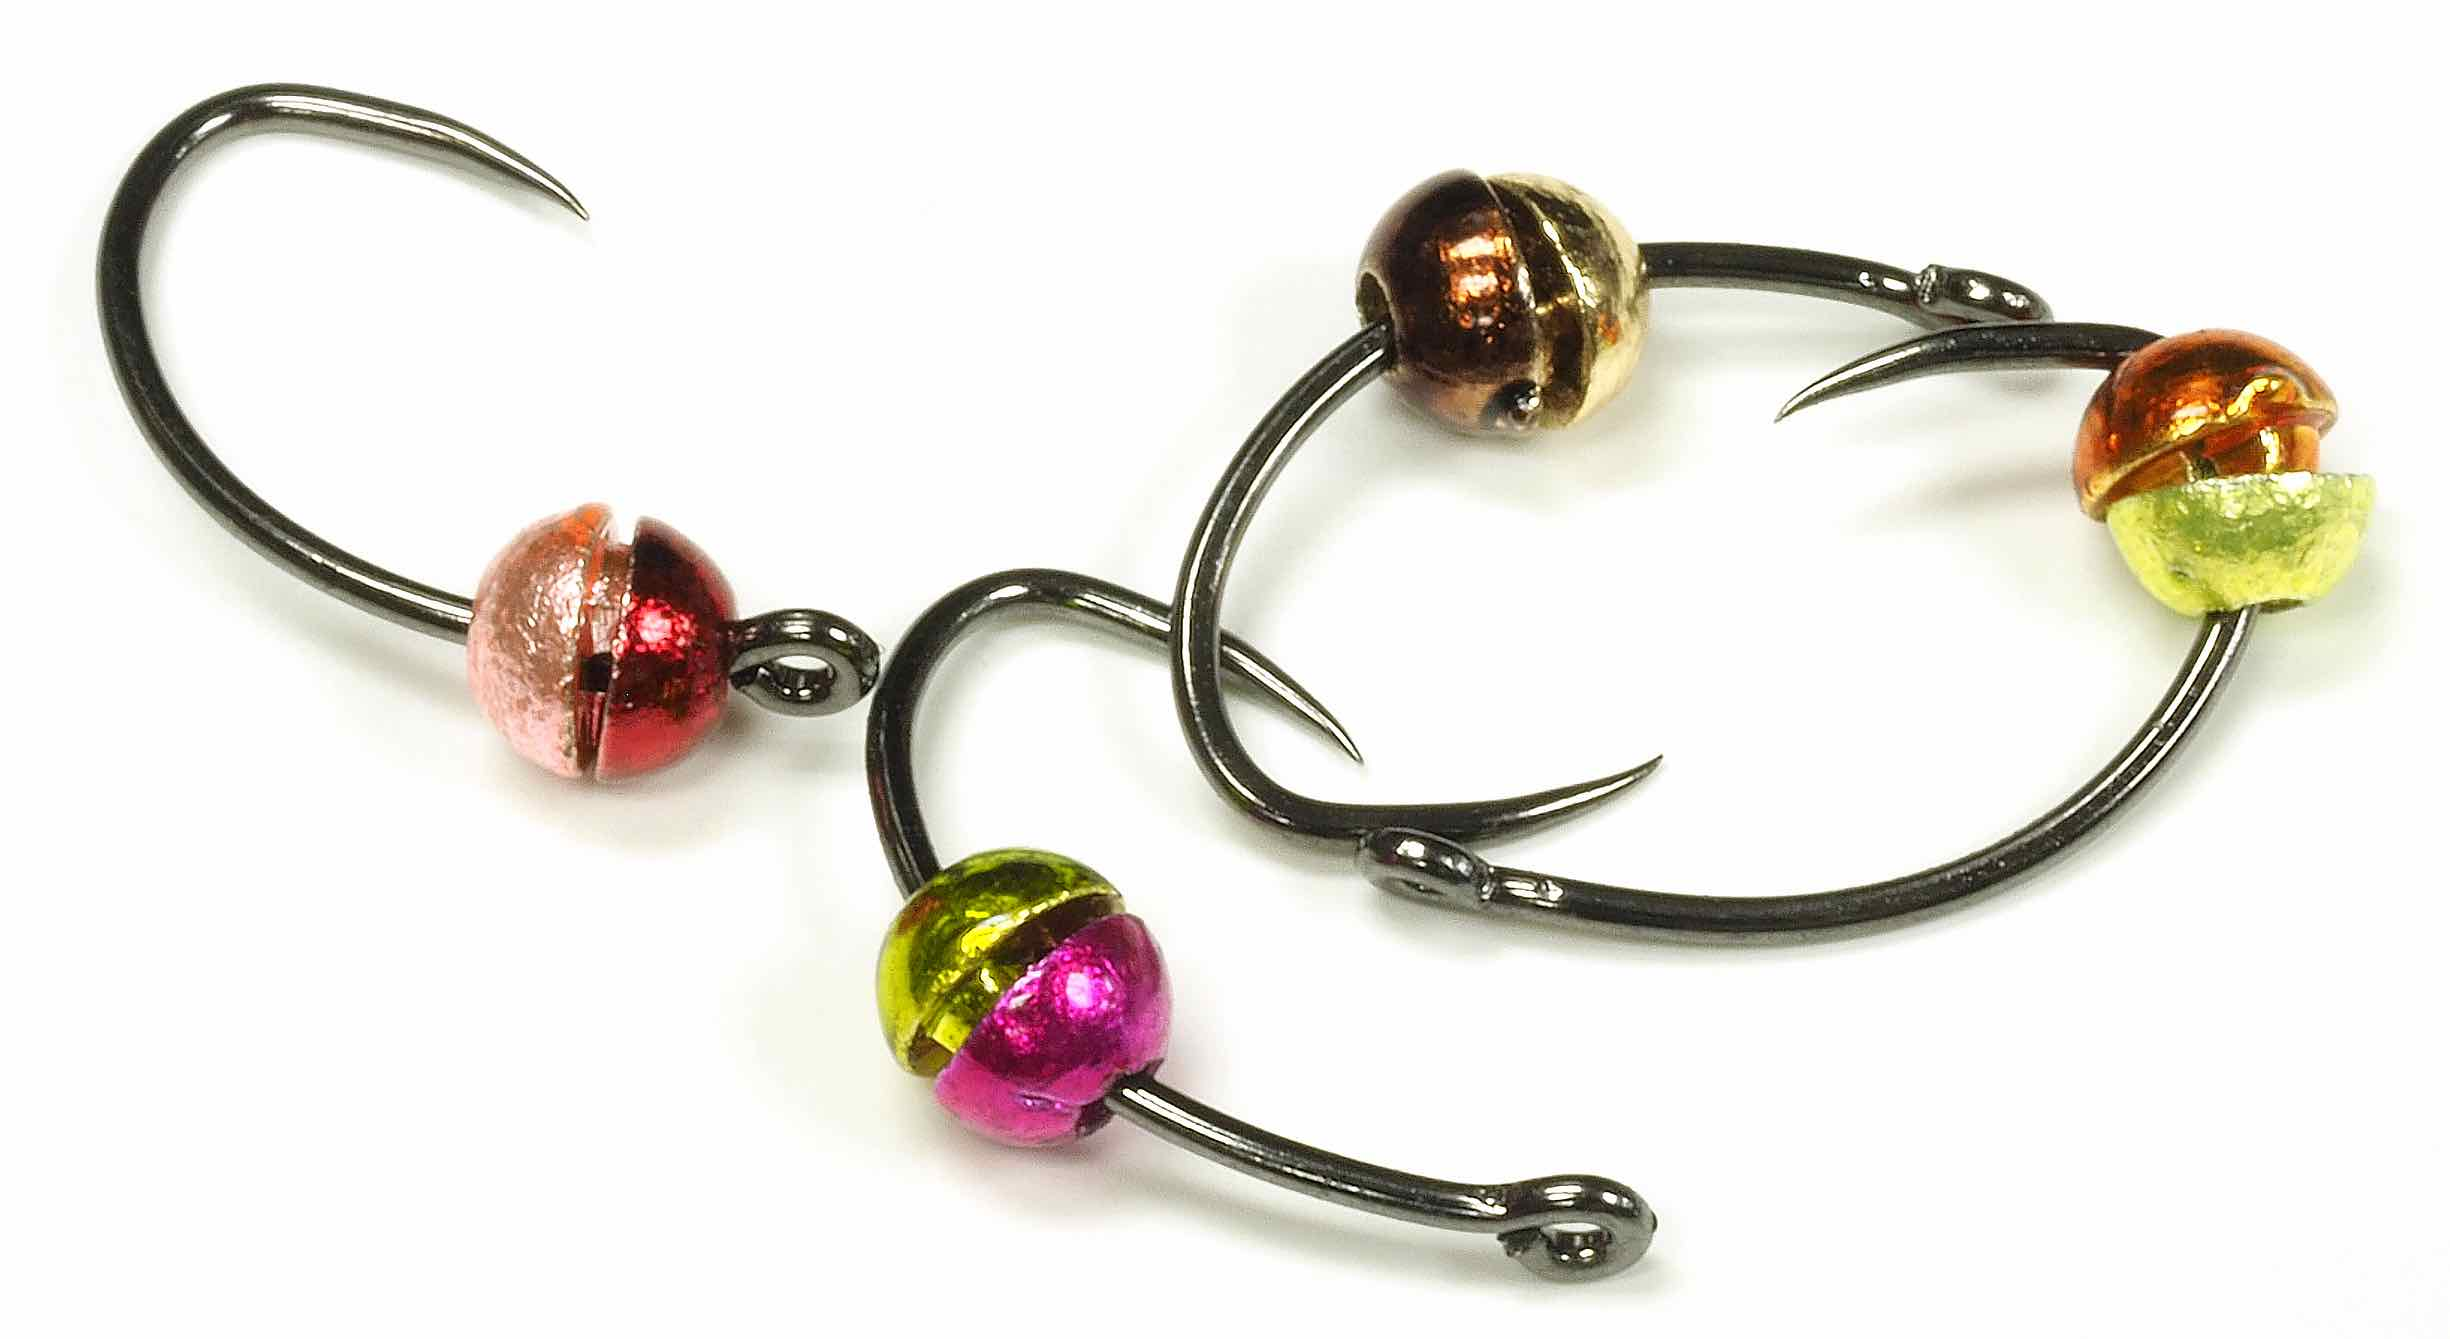 Pro Tyer 2 Tone Tungsten Half Beads - The Canadian Llama Company